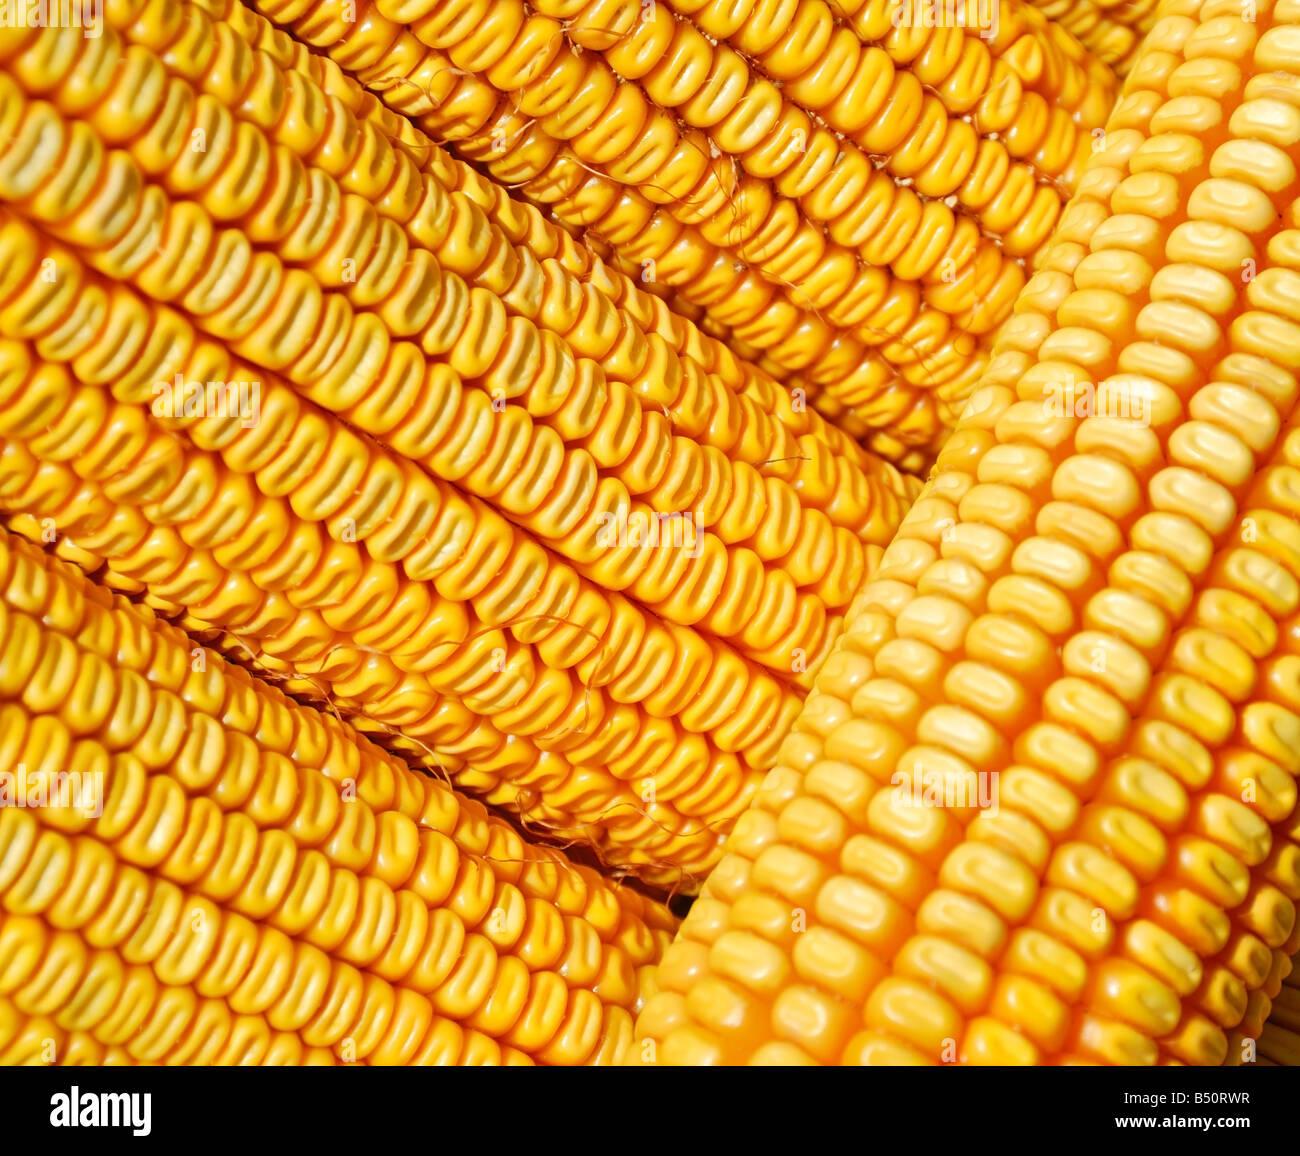 Collection de maïs jaune Photo Stock